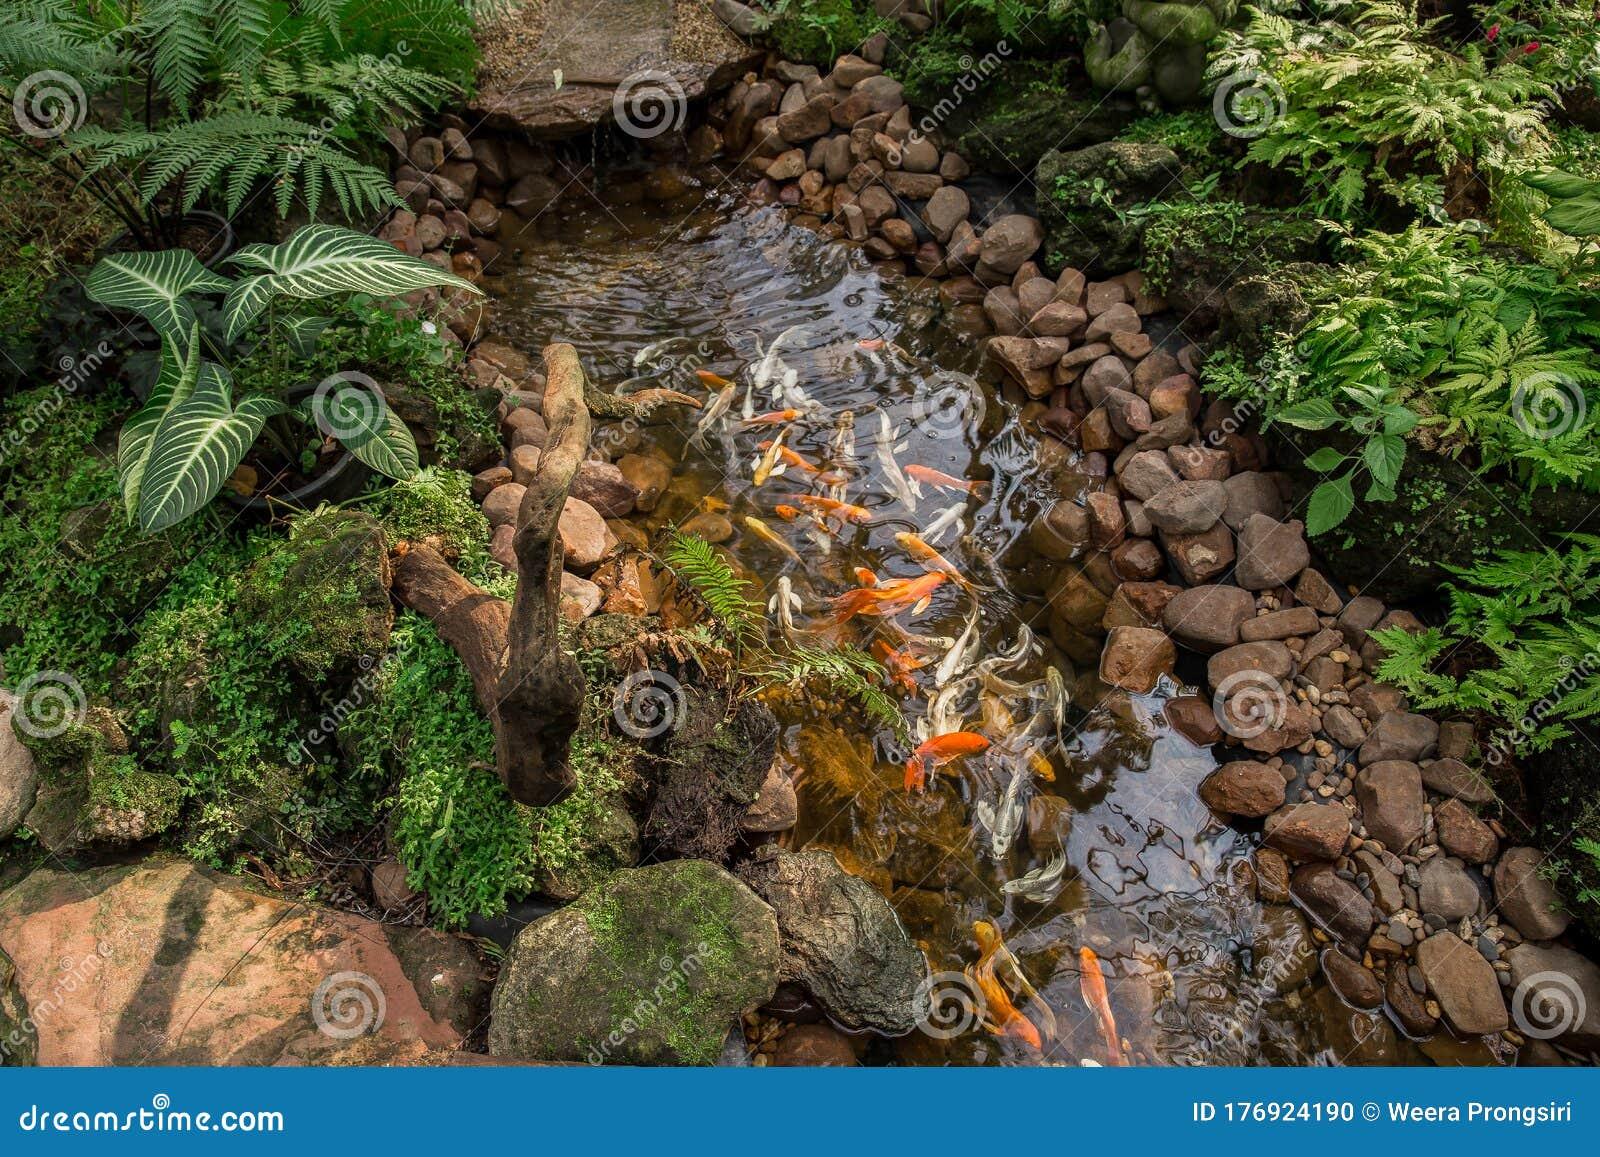 Pond Koi Carp Ornamental Garden Japanese Garden Front Or Back Yard Stock Photo Image Of Nature Orange 176924190